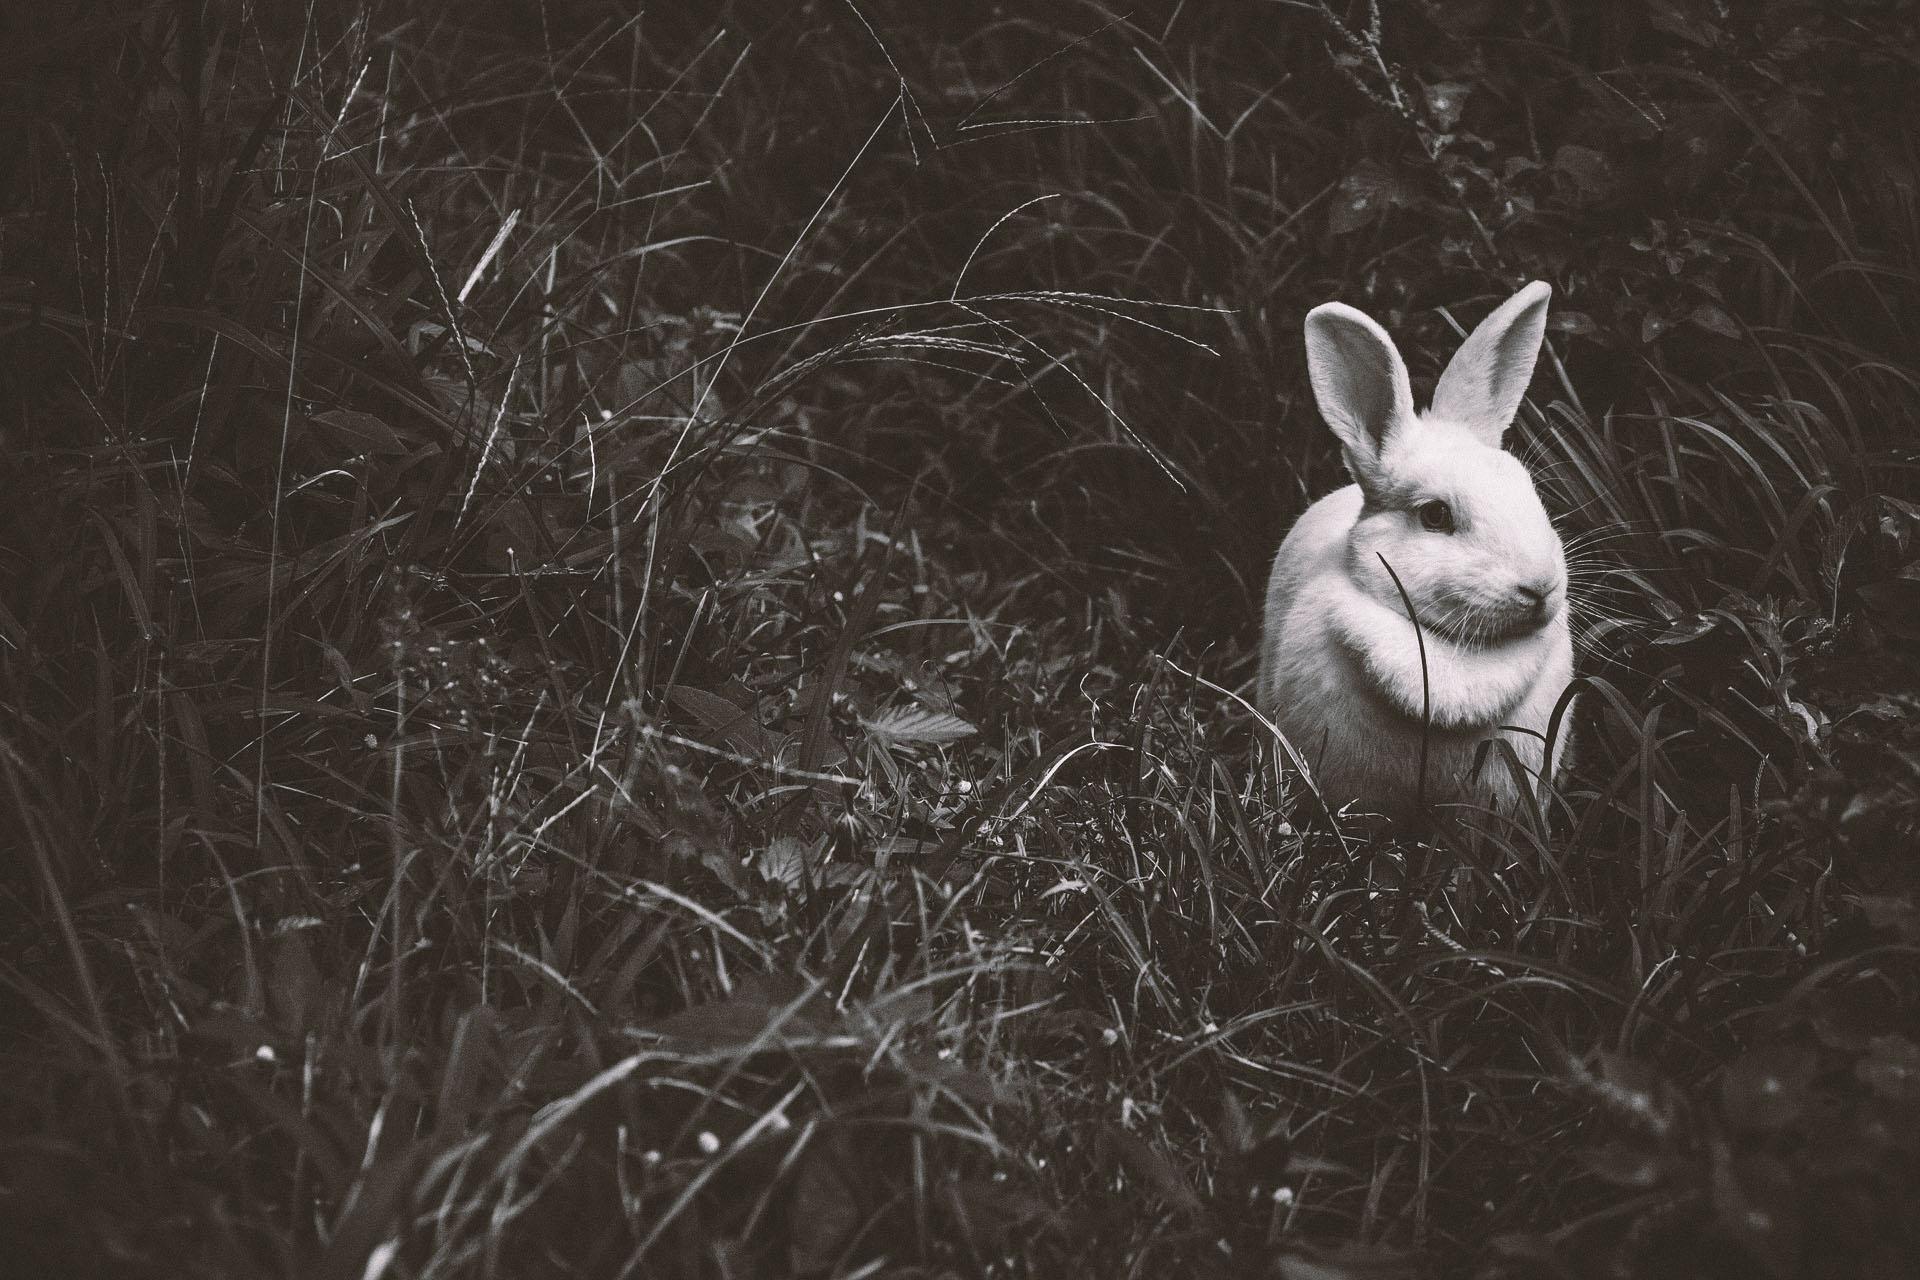 animal-1845263_1920.jpg